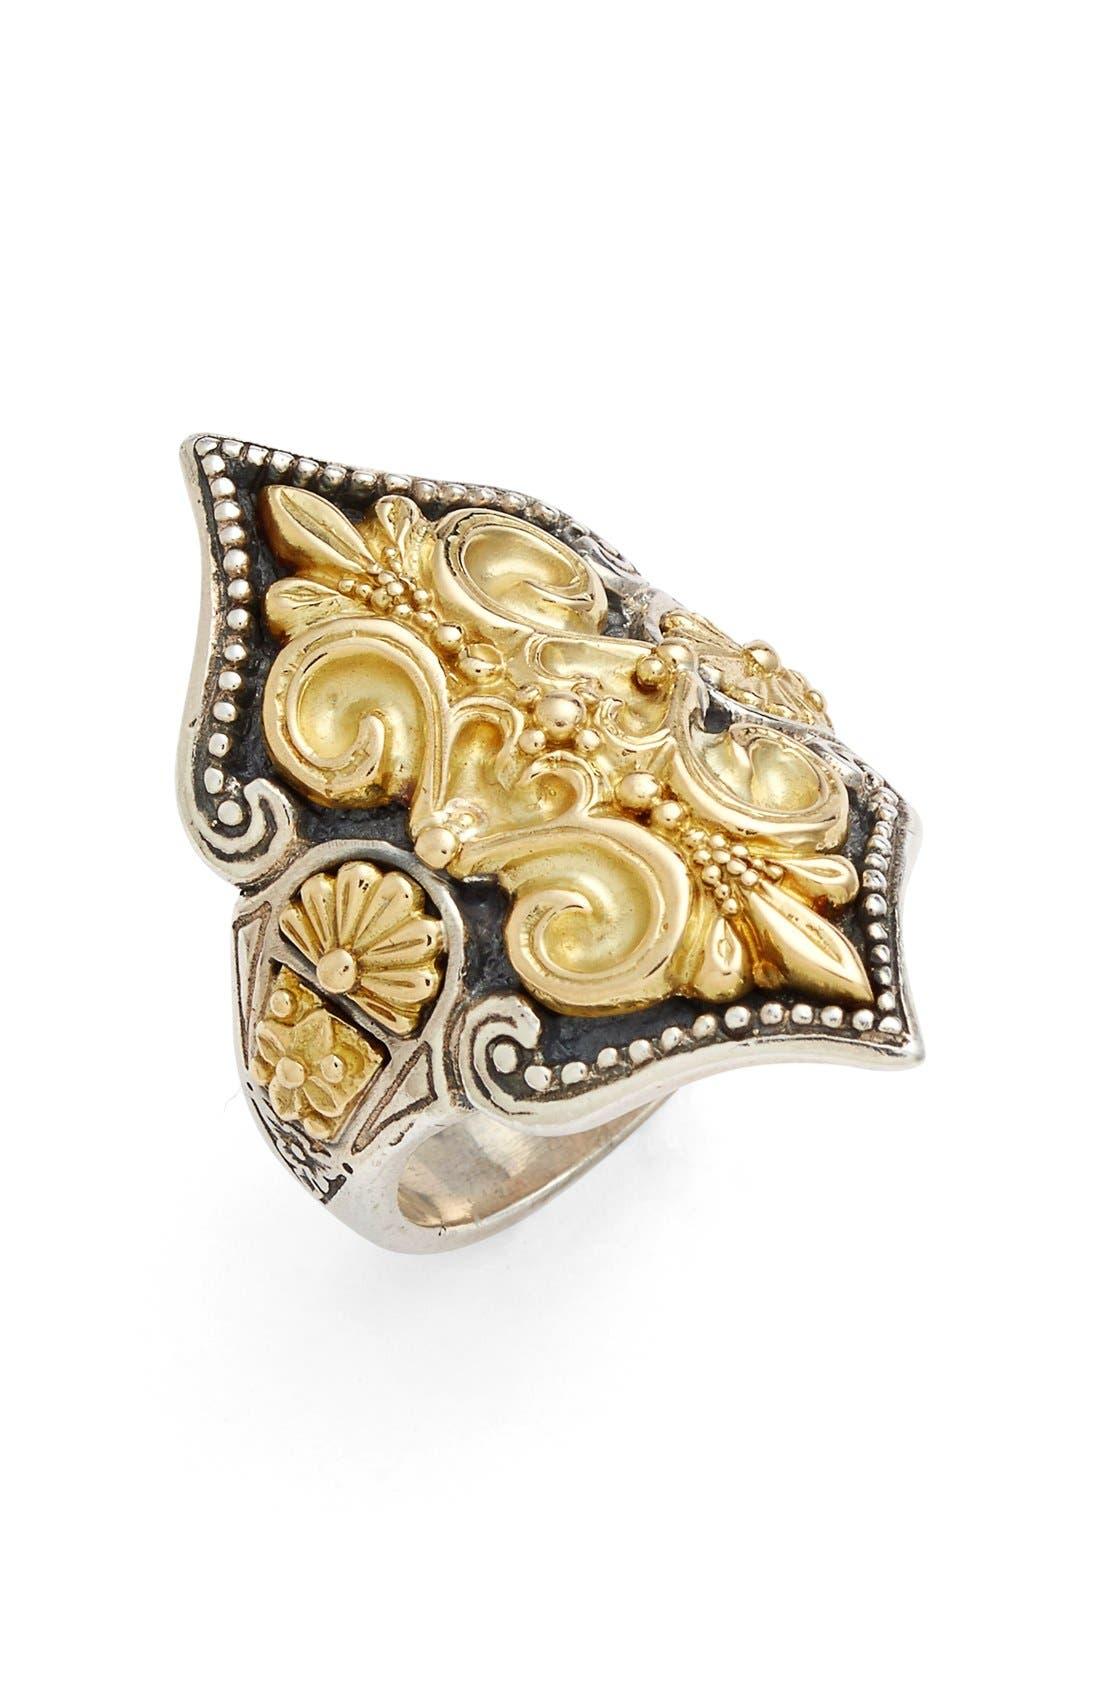 KONSTANTINO 'Hebe' Fleur de Lis Ring